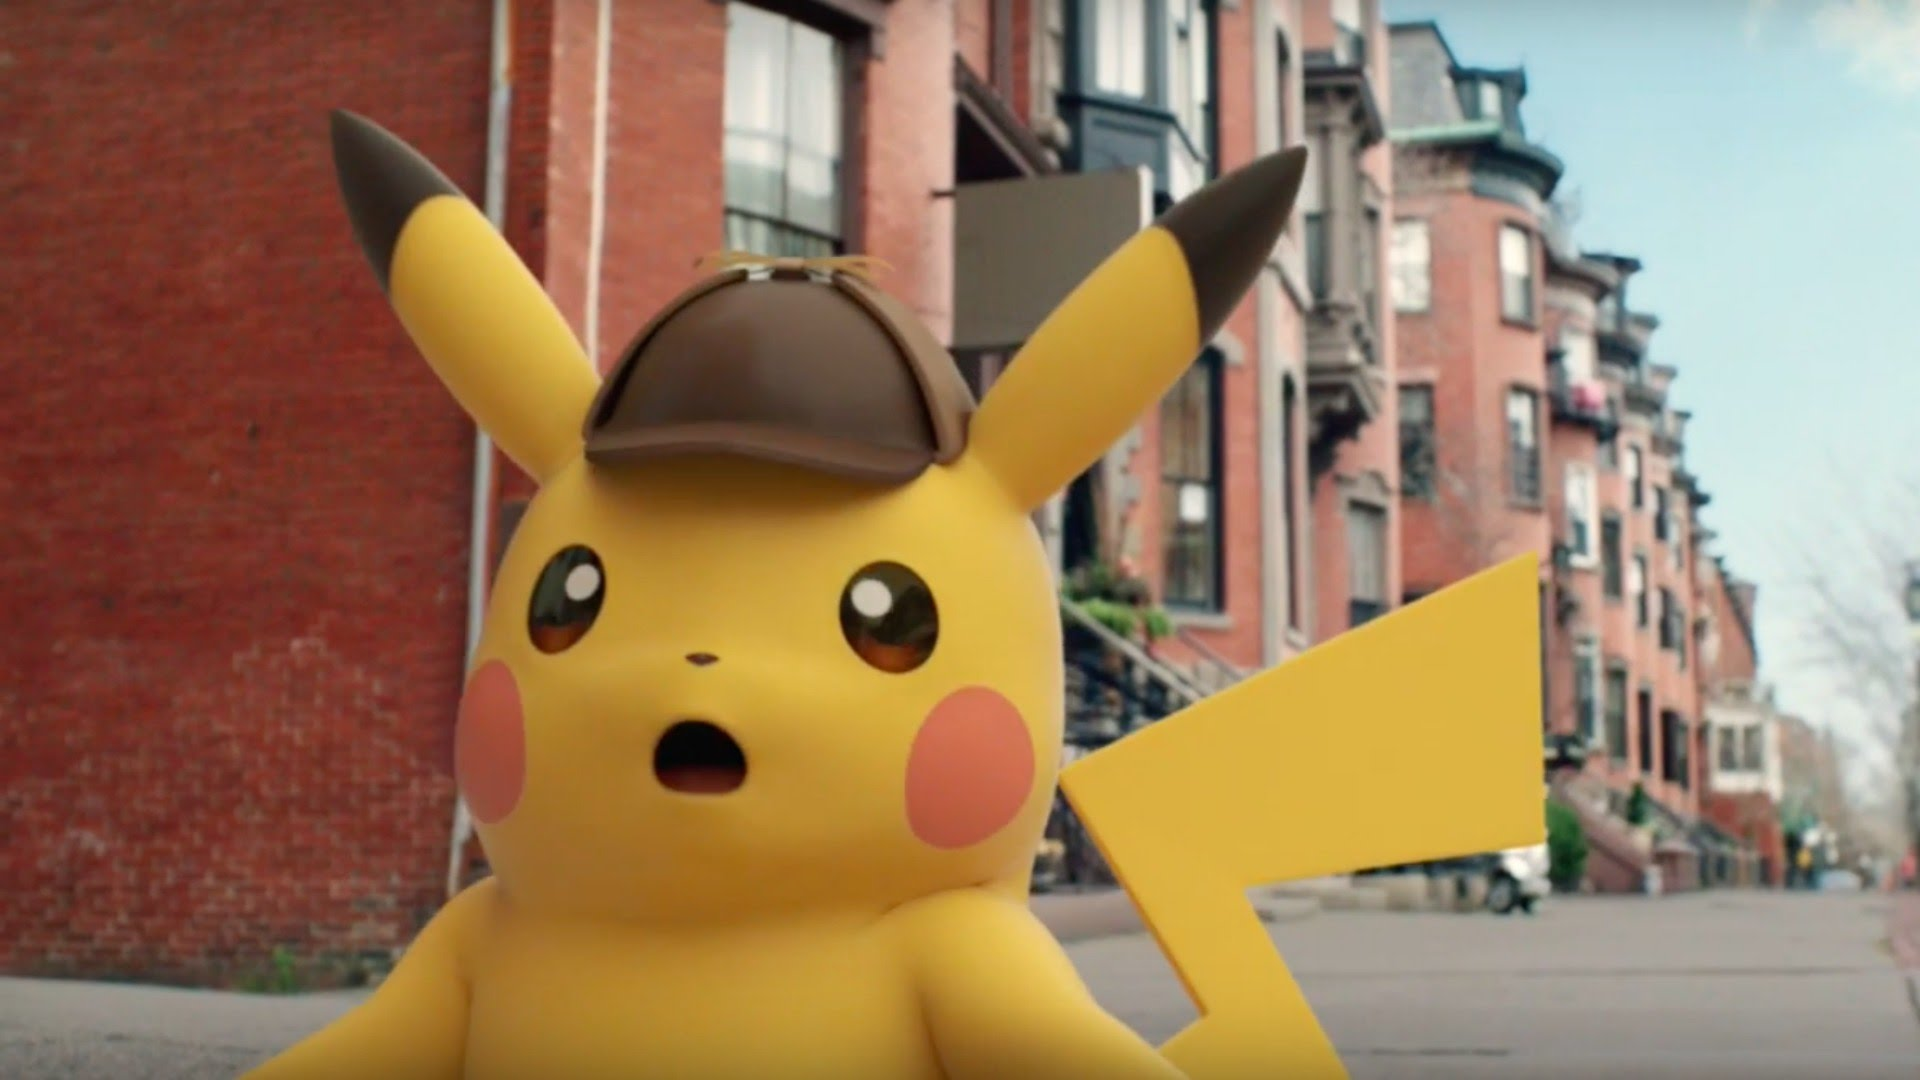 Chuan bi co phim ve Pikachu phien ban nguoi that dong hinh anh 1